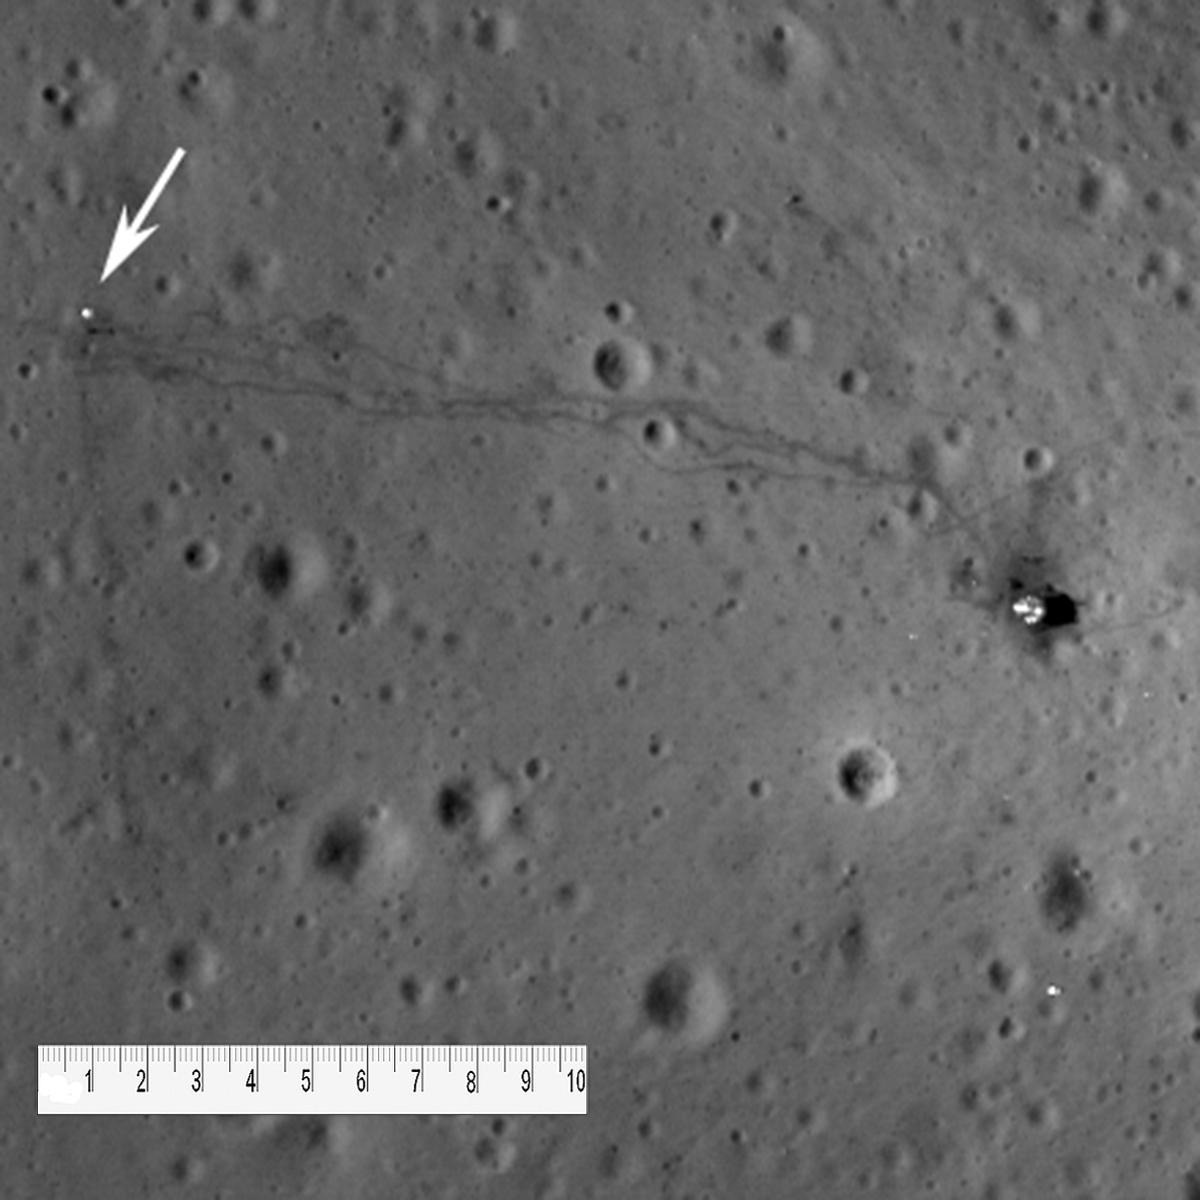 apollo tracks on moon - photo #7